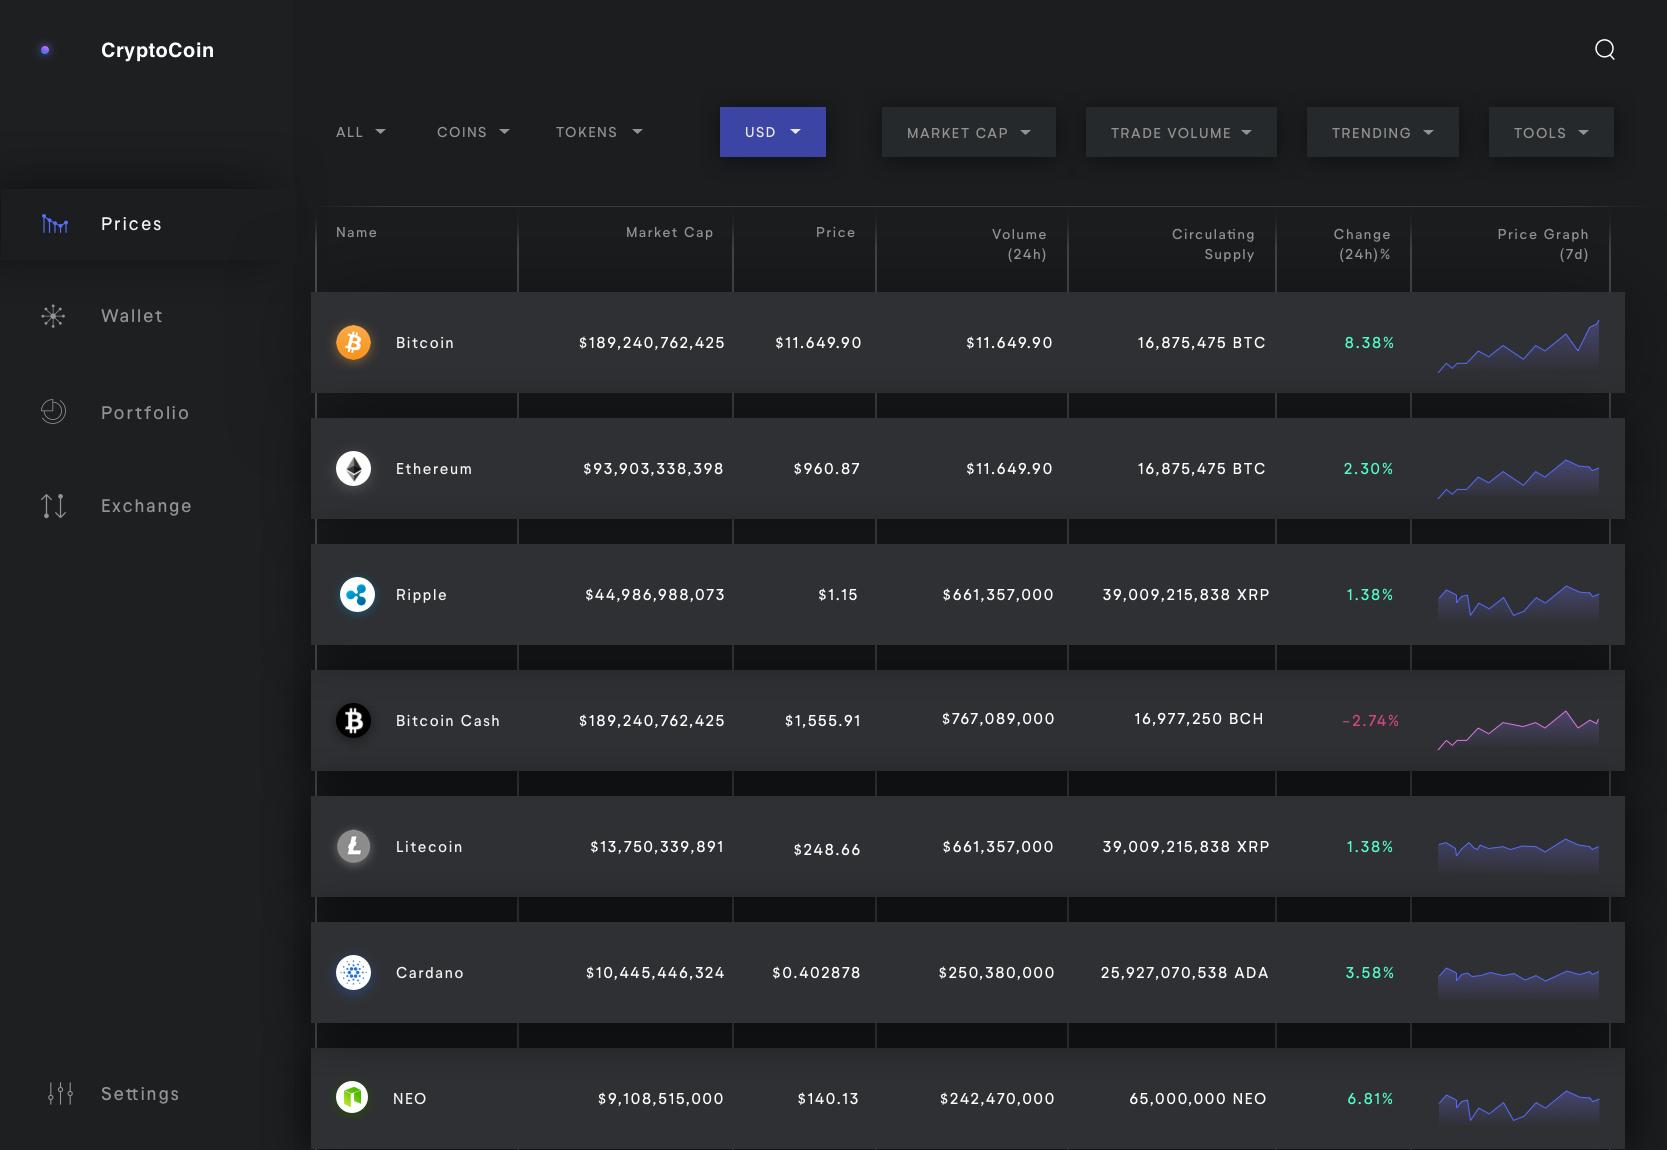 Cryptocoin desktop dashboard